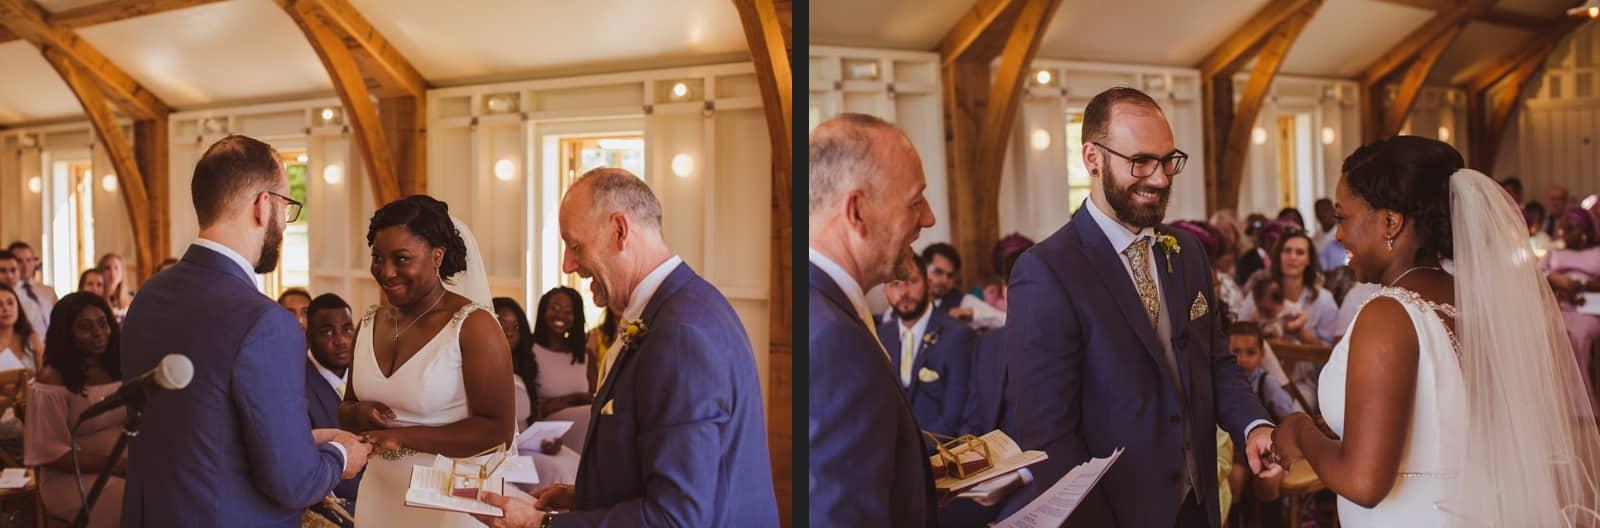 Cotswolds Wedding Photographer 0081